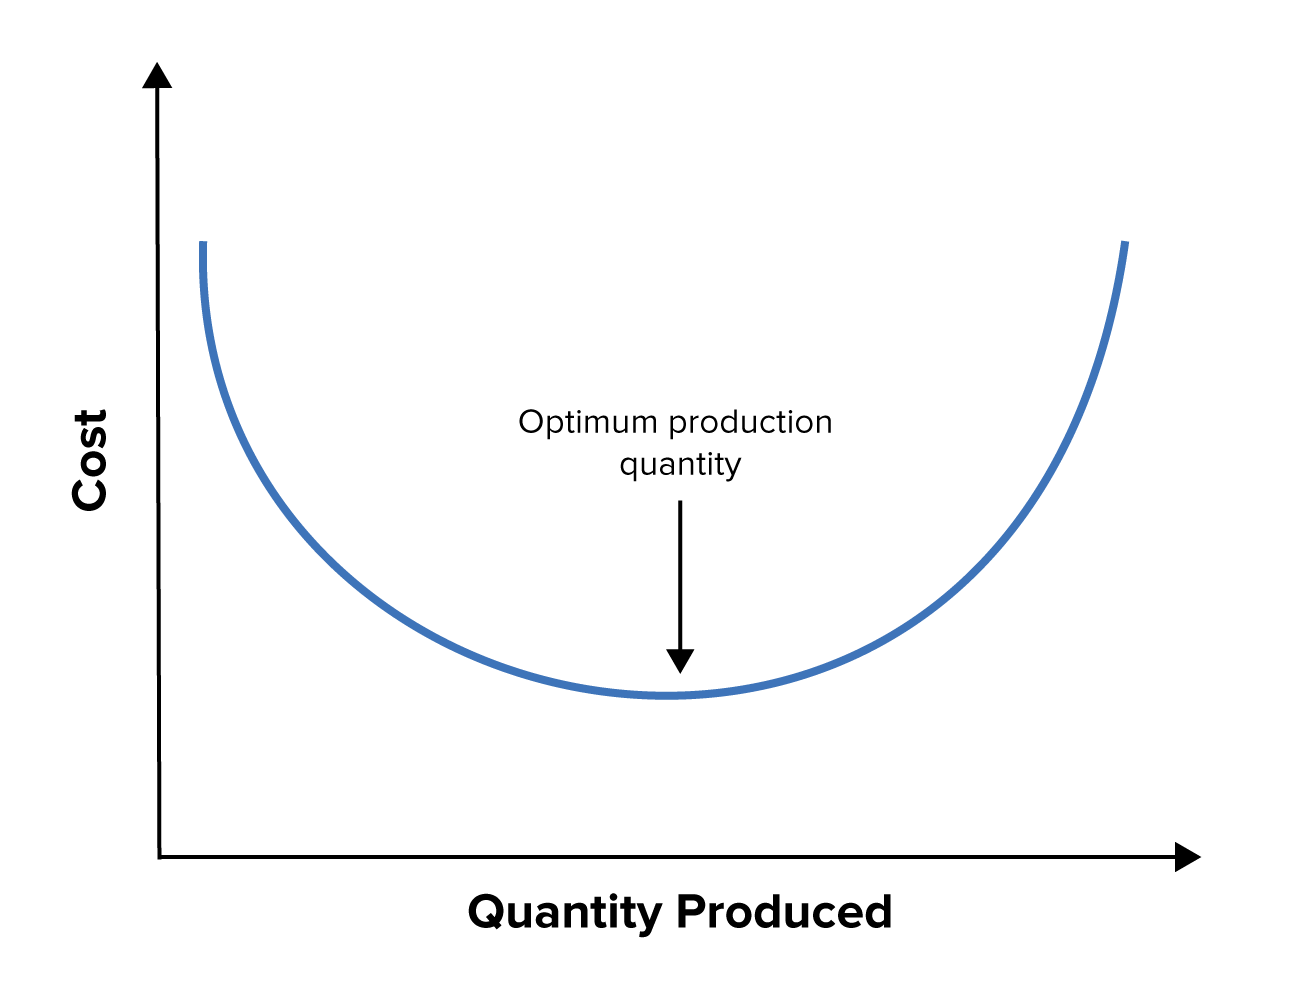 grafik economies of scale